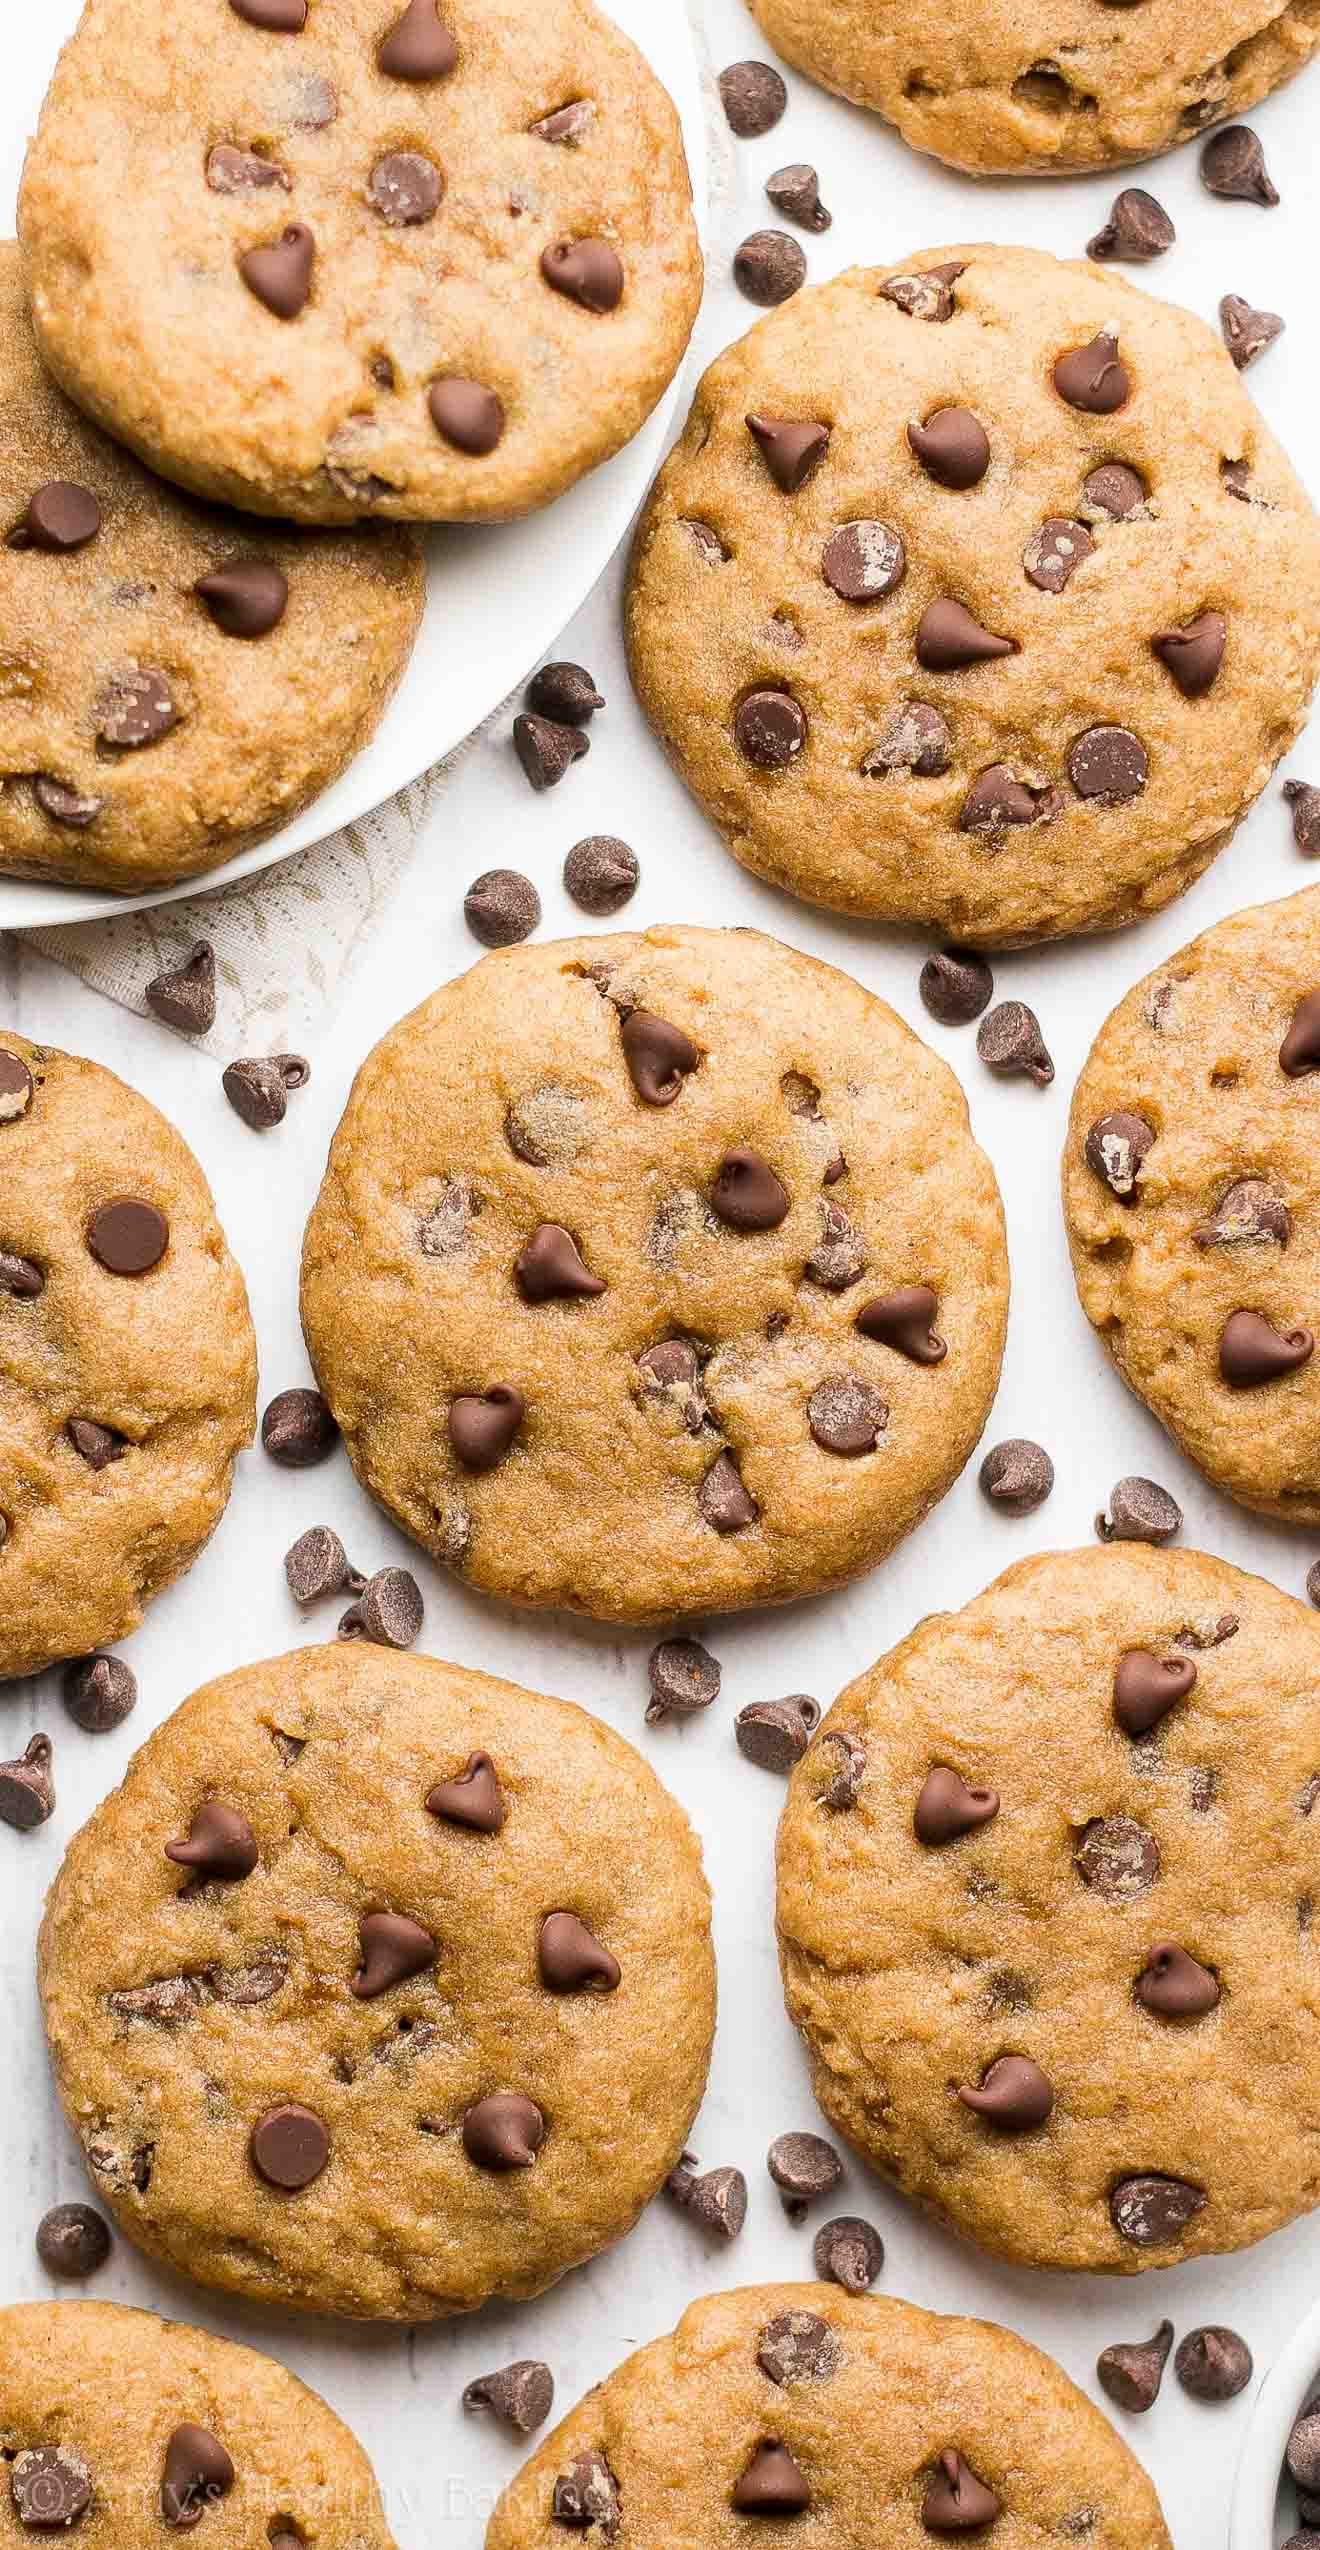 Healthy Cookies Recipe  Healthy Banana Chocolate Chip Cookies Recipe Video